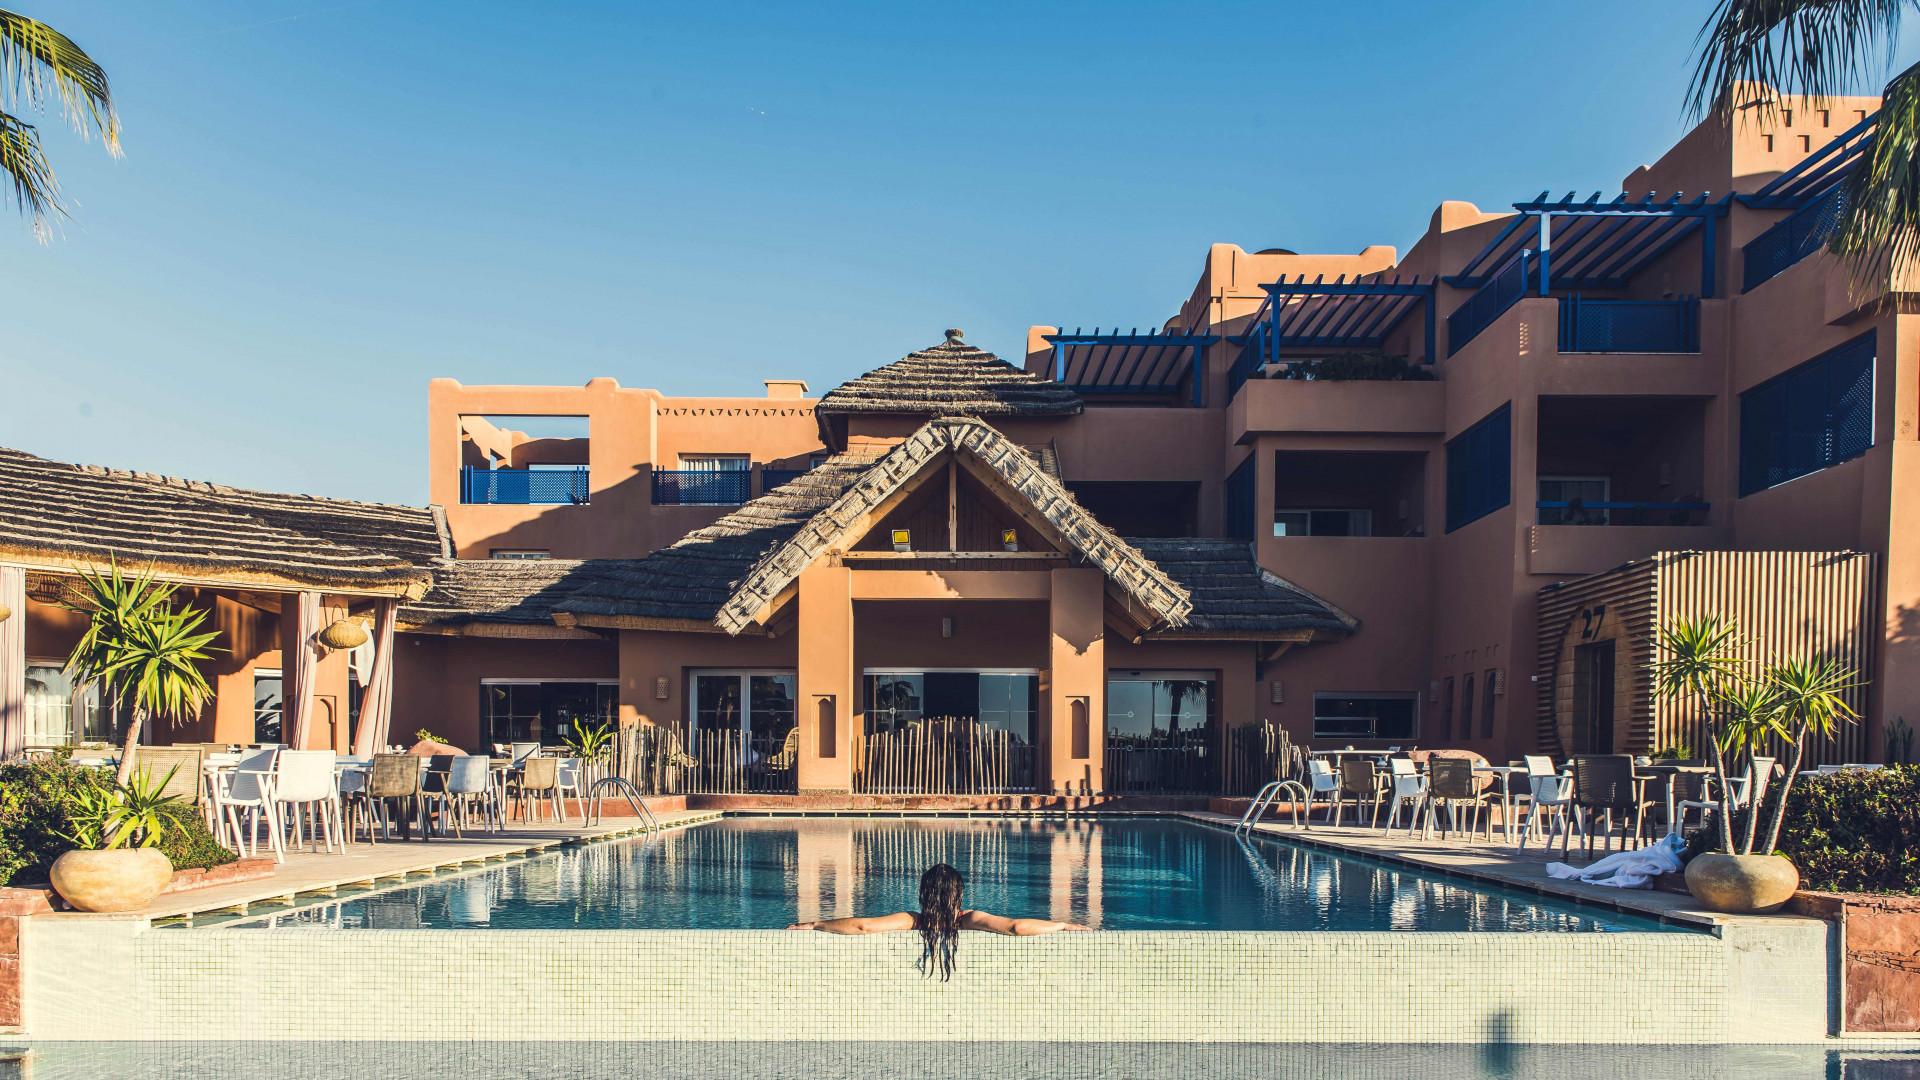 Infinity Pool at Paradis Plage, Agadir, Morocco